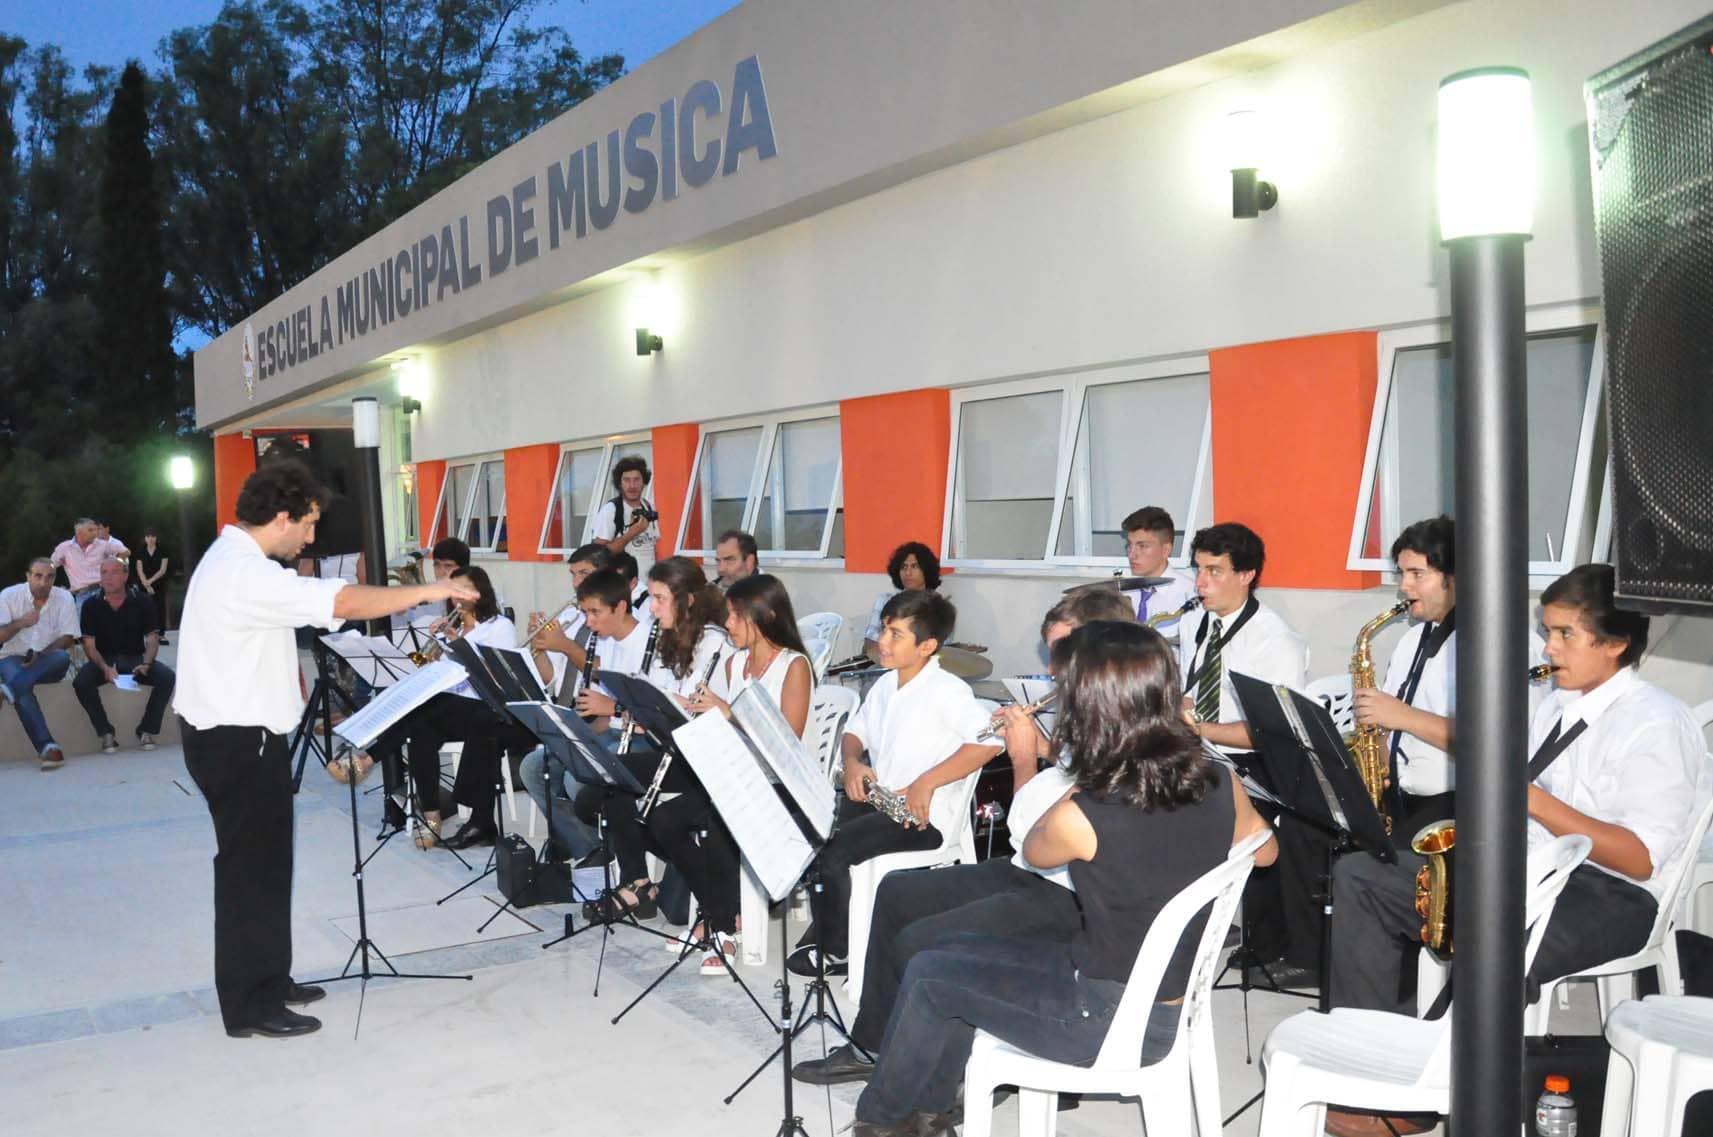 Homenaje a Barracchia escuela de música - enero 2016 (13)